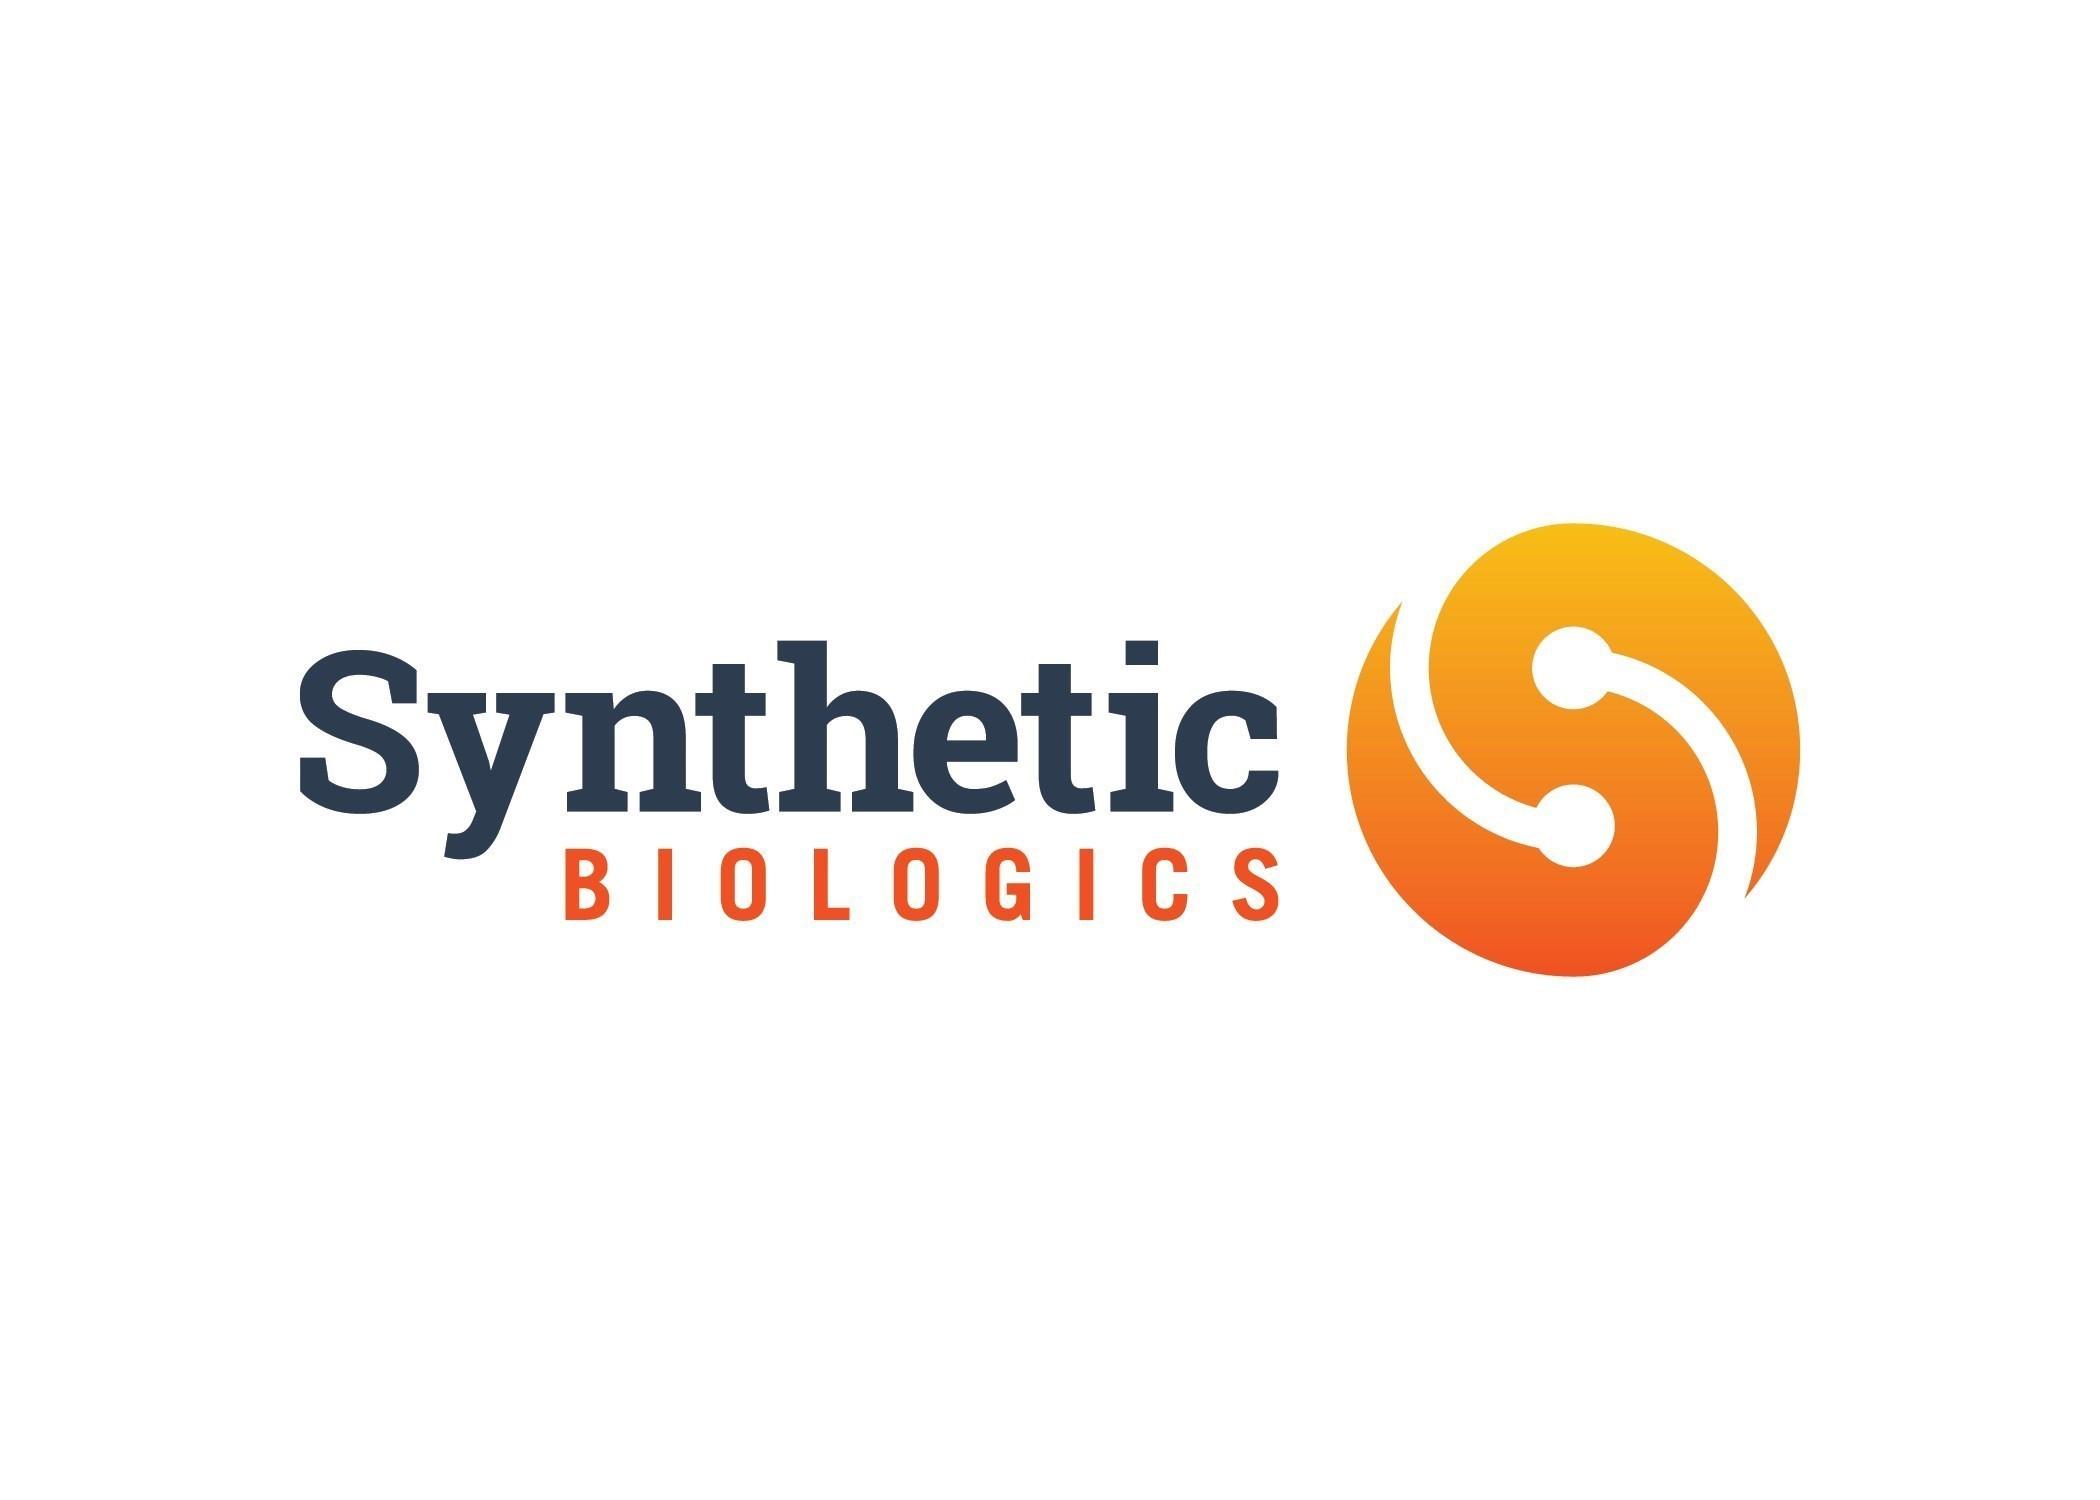 Synthetic Biologics, Inc.  www.syntheticbiologics.com (PRNewsFoto/Synthetic Biologics, Inc.)